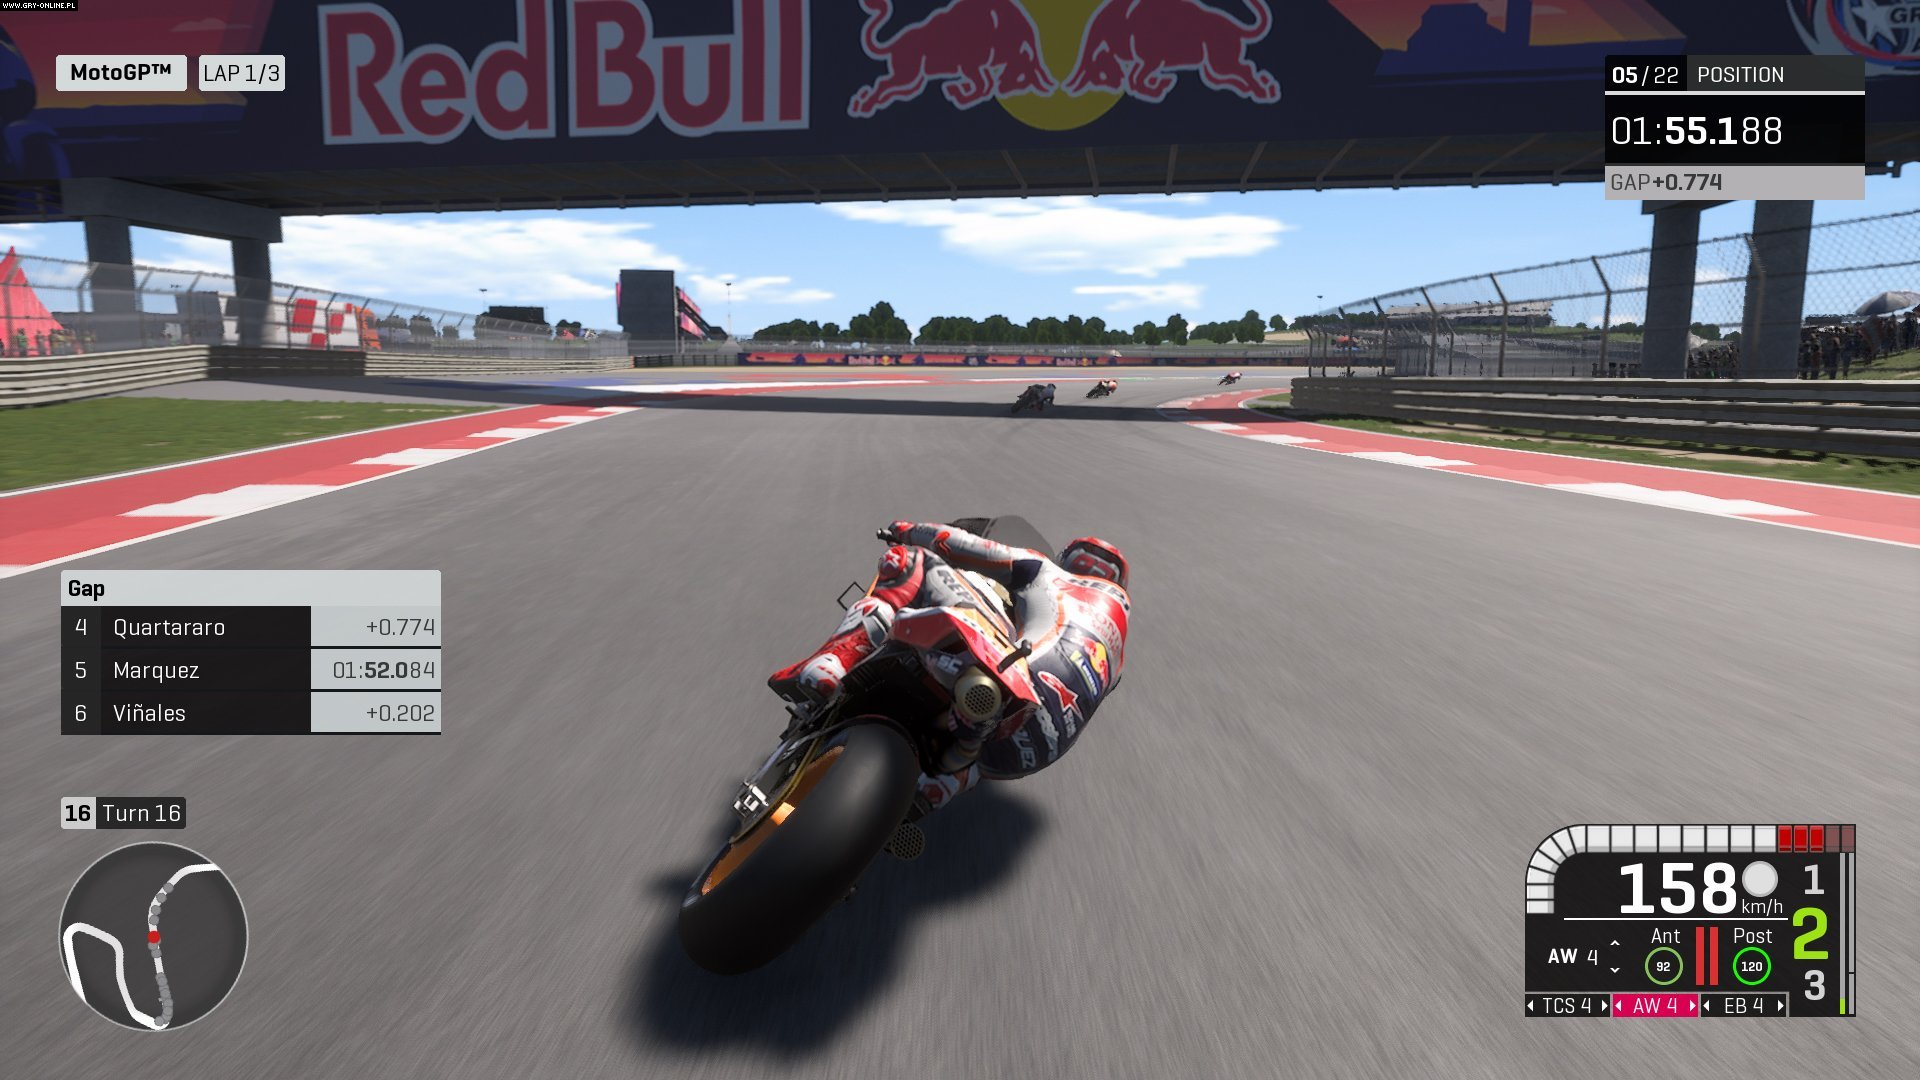 MotoGP 19 PC, PS4, XONE, Switch Games Image 3/15, Milestone